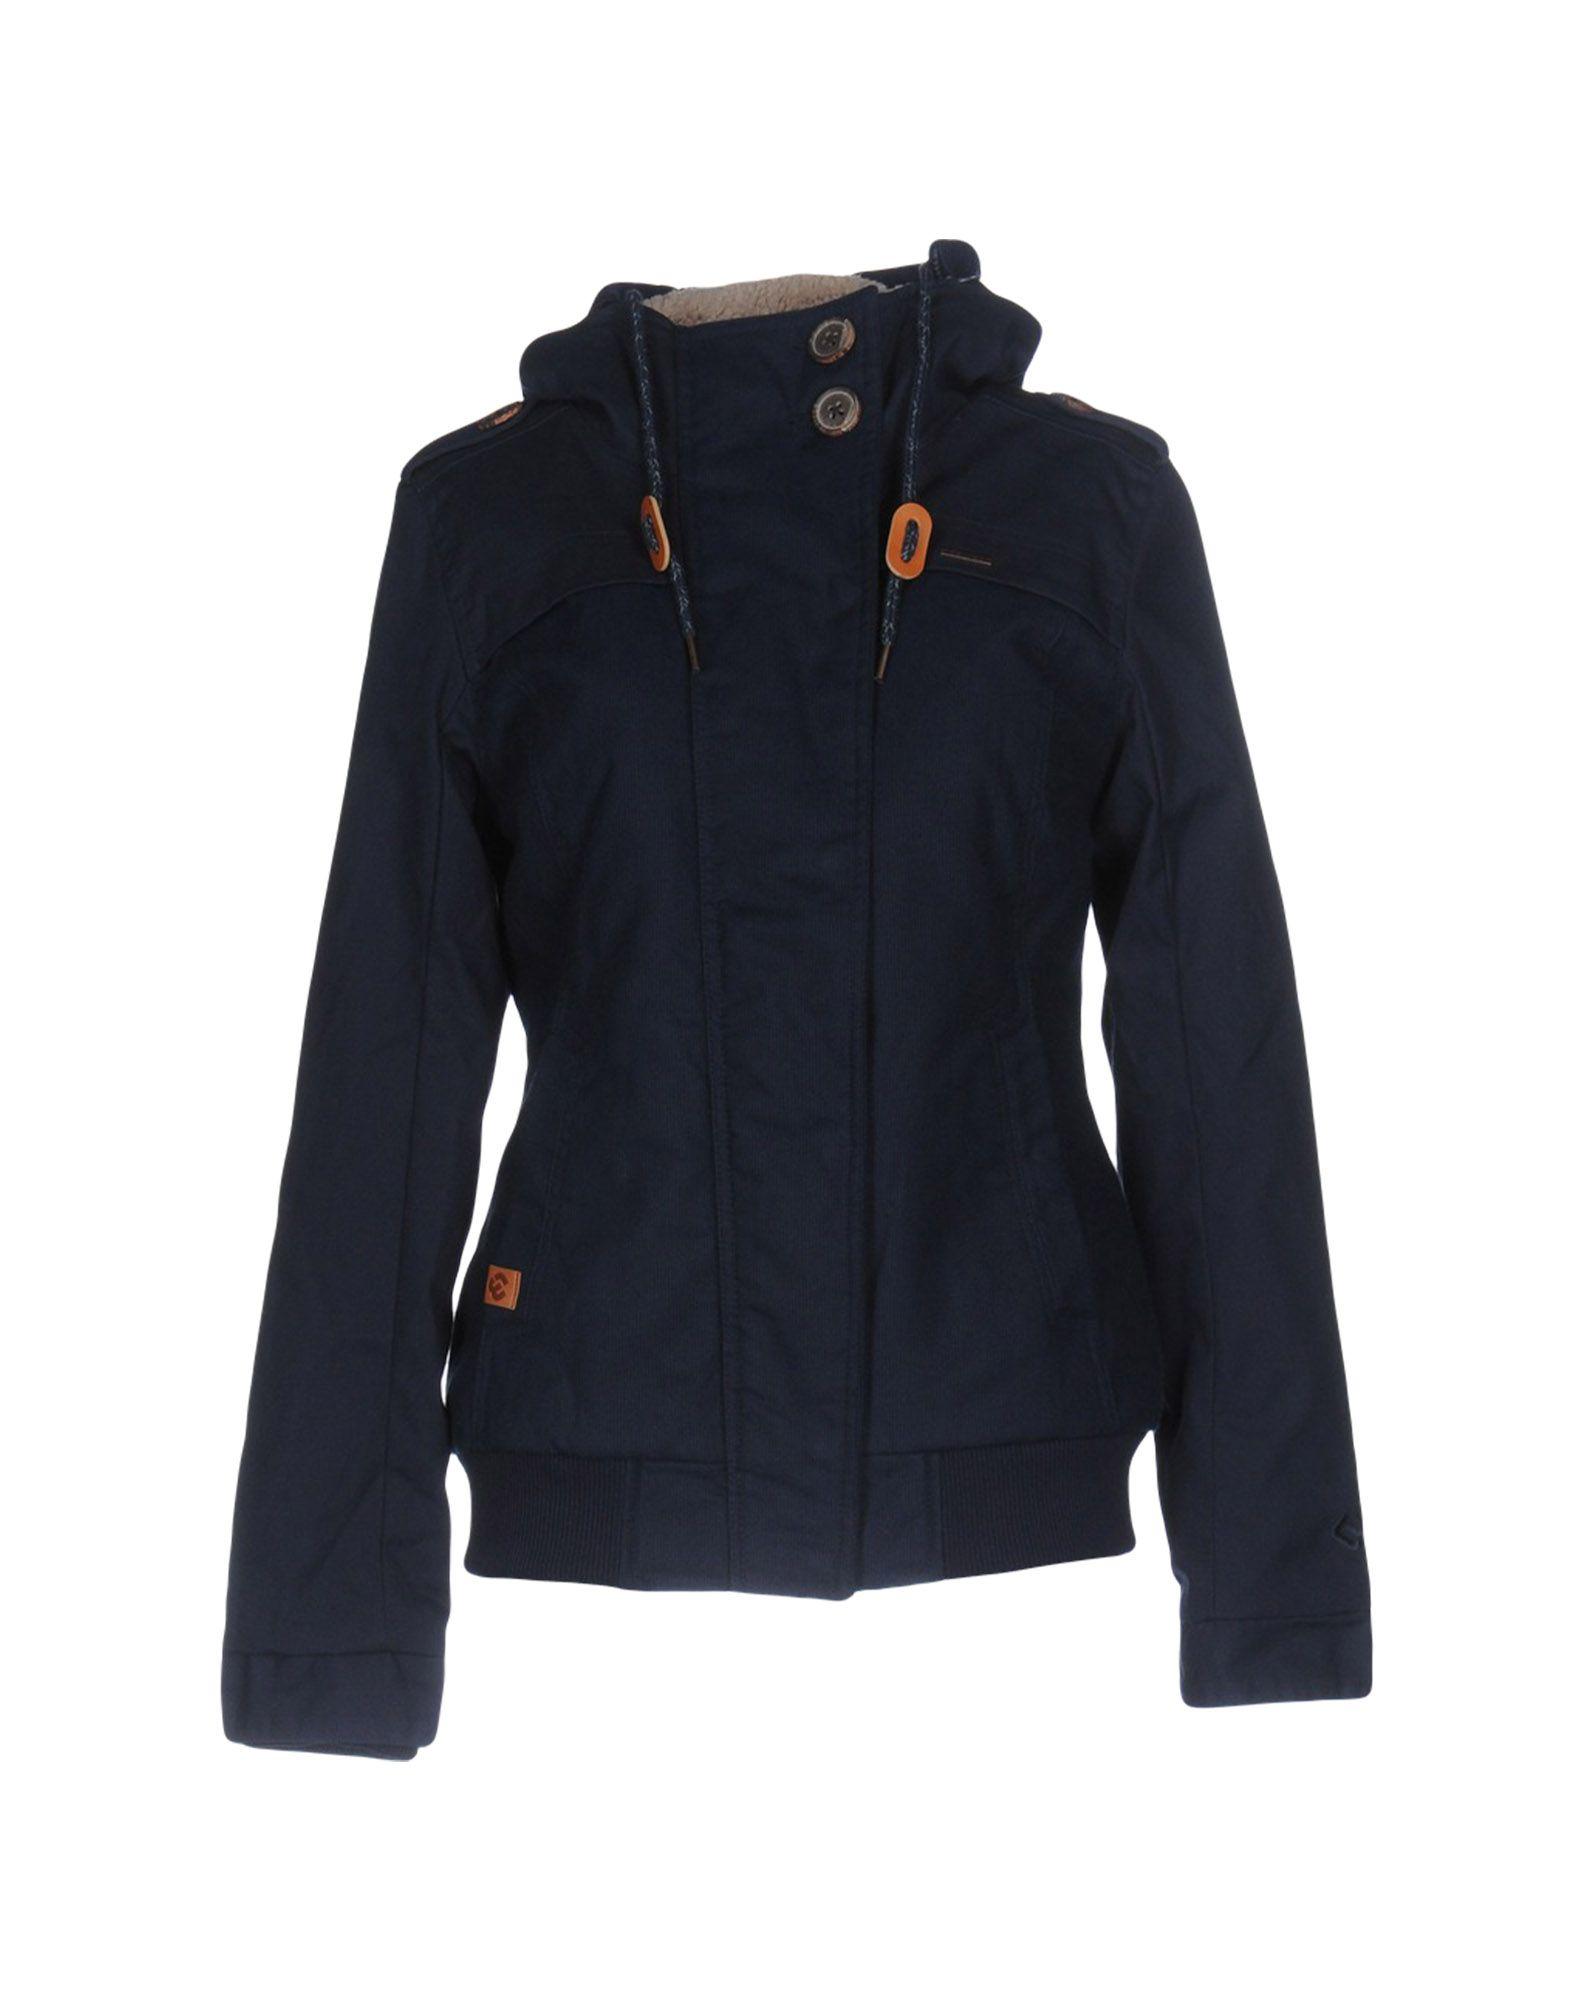 RAGWEAR Damen Jacke Farbe Dunkelblau Größe 5